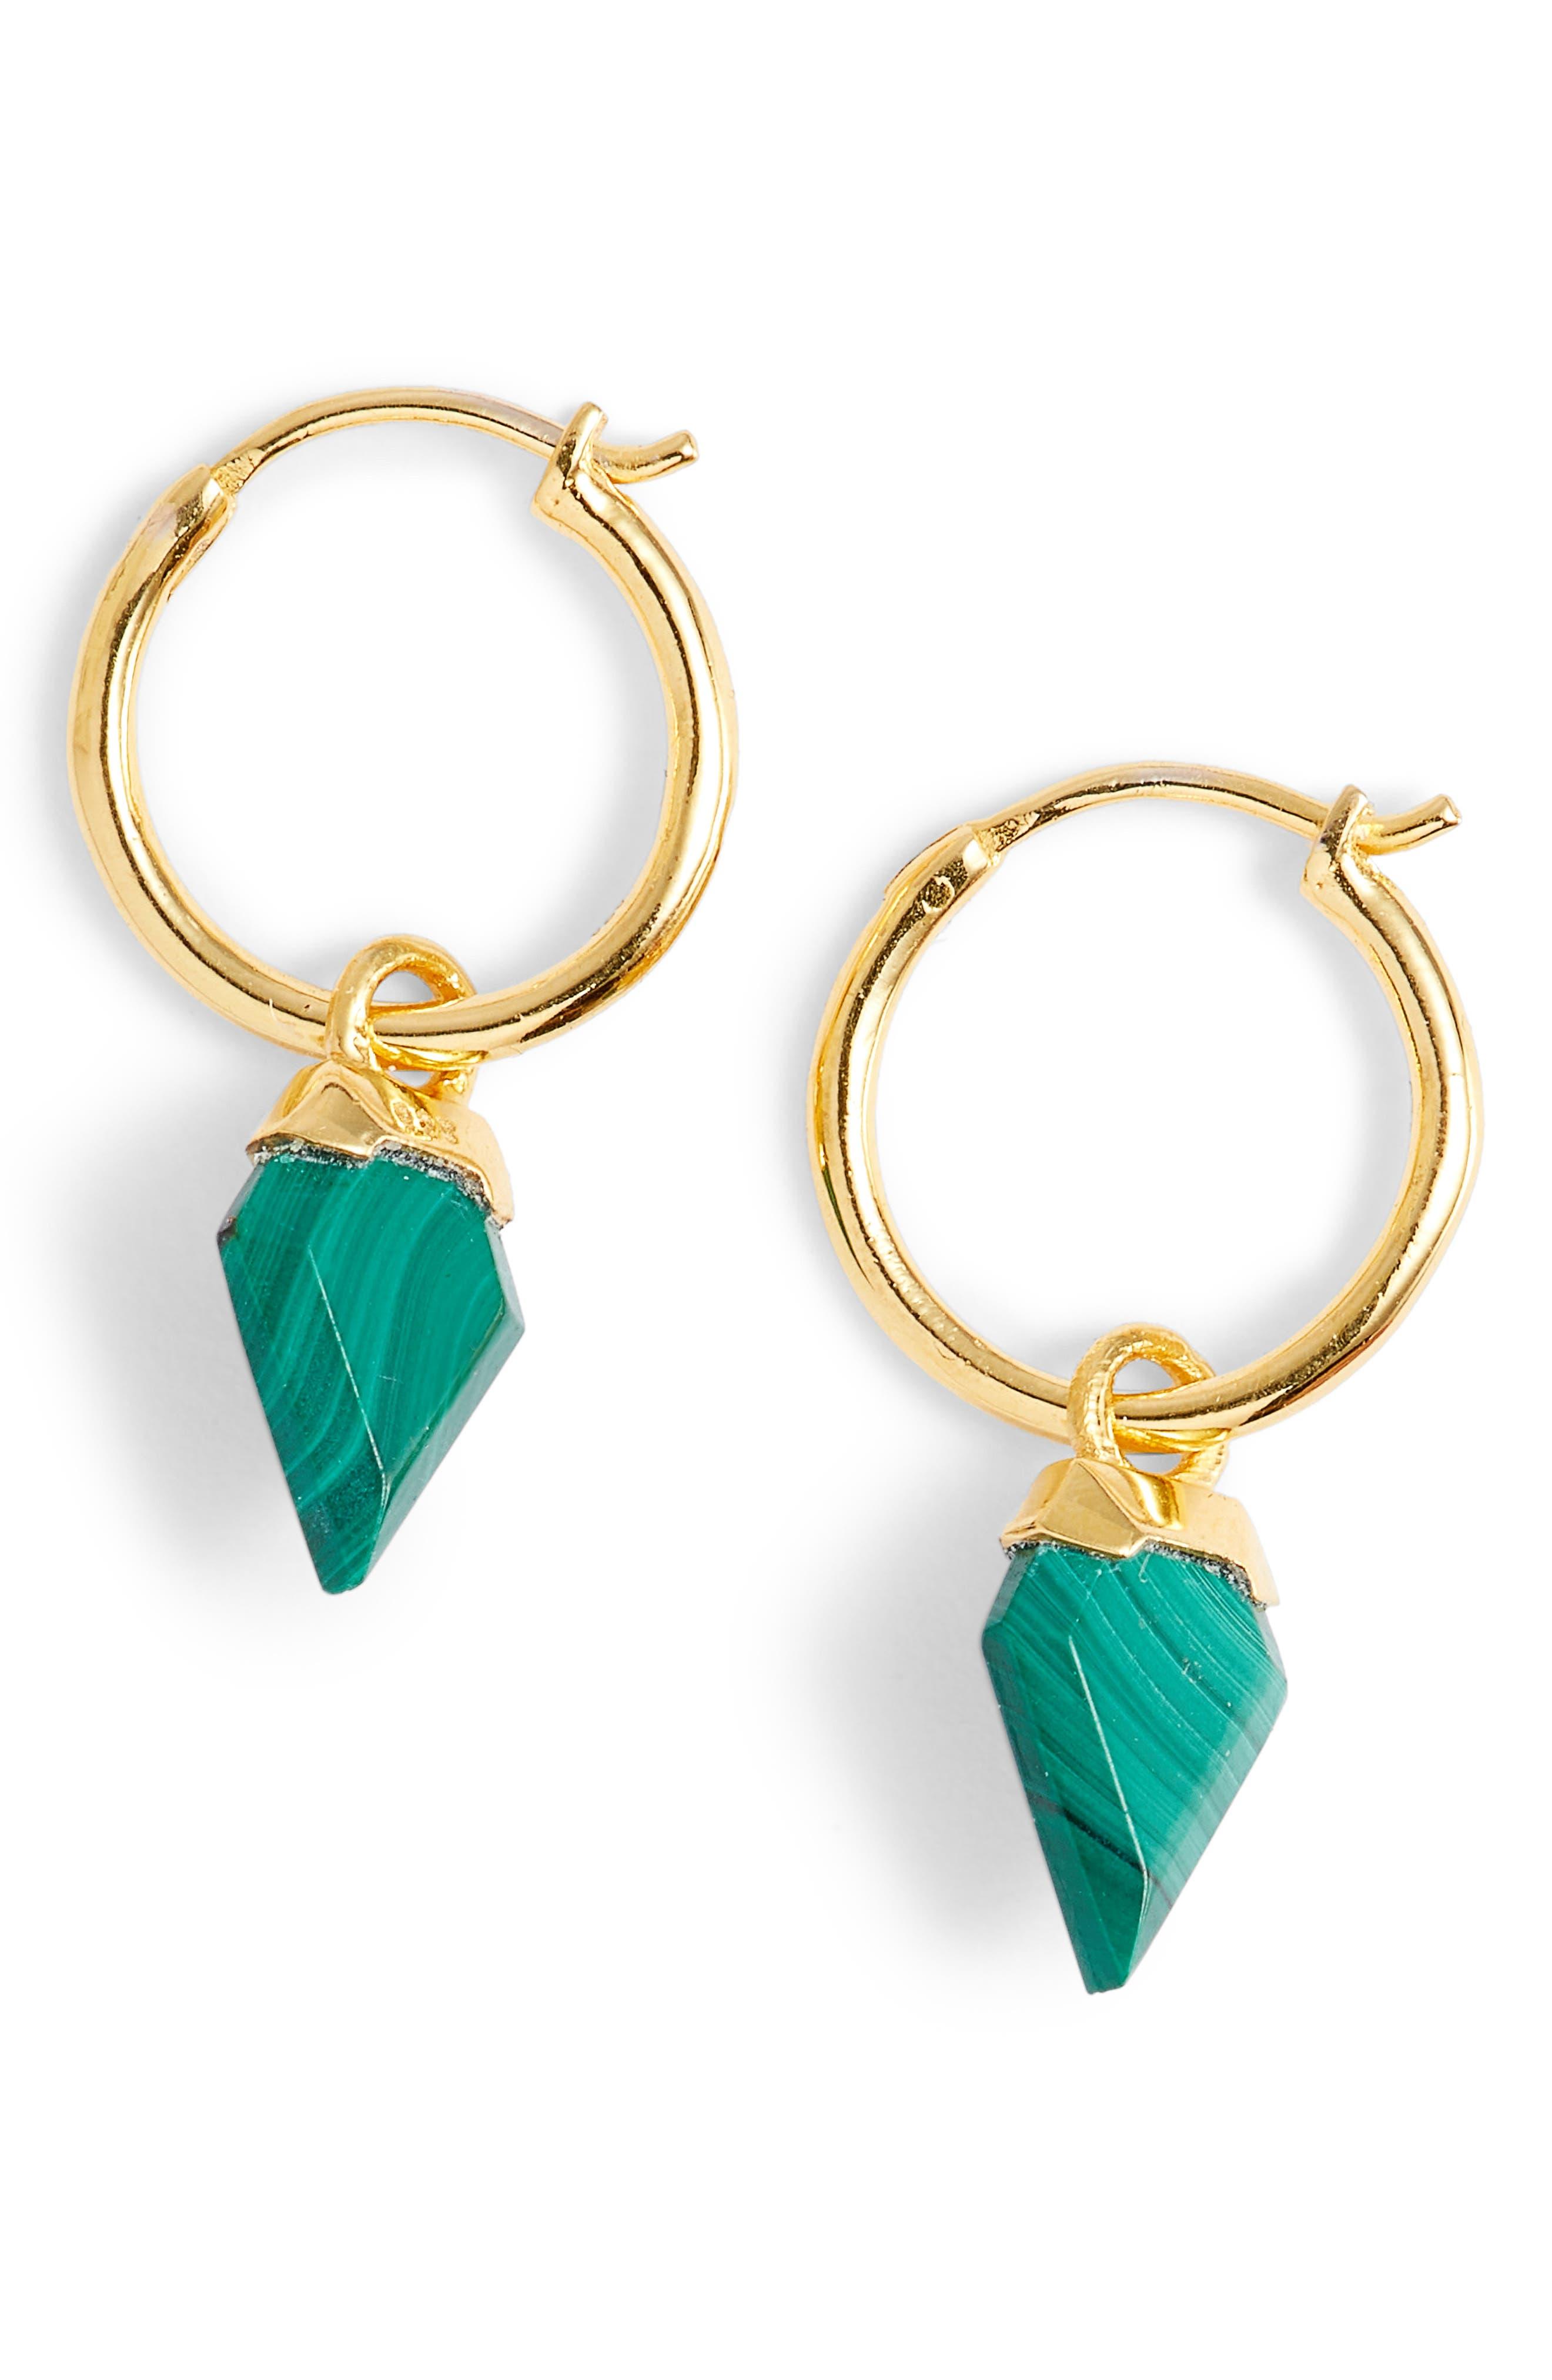 Mini Shield Hoop Earrings,                             Main thumbnail 1, color,                             MALACHITE/ GOLD